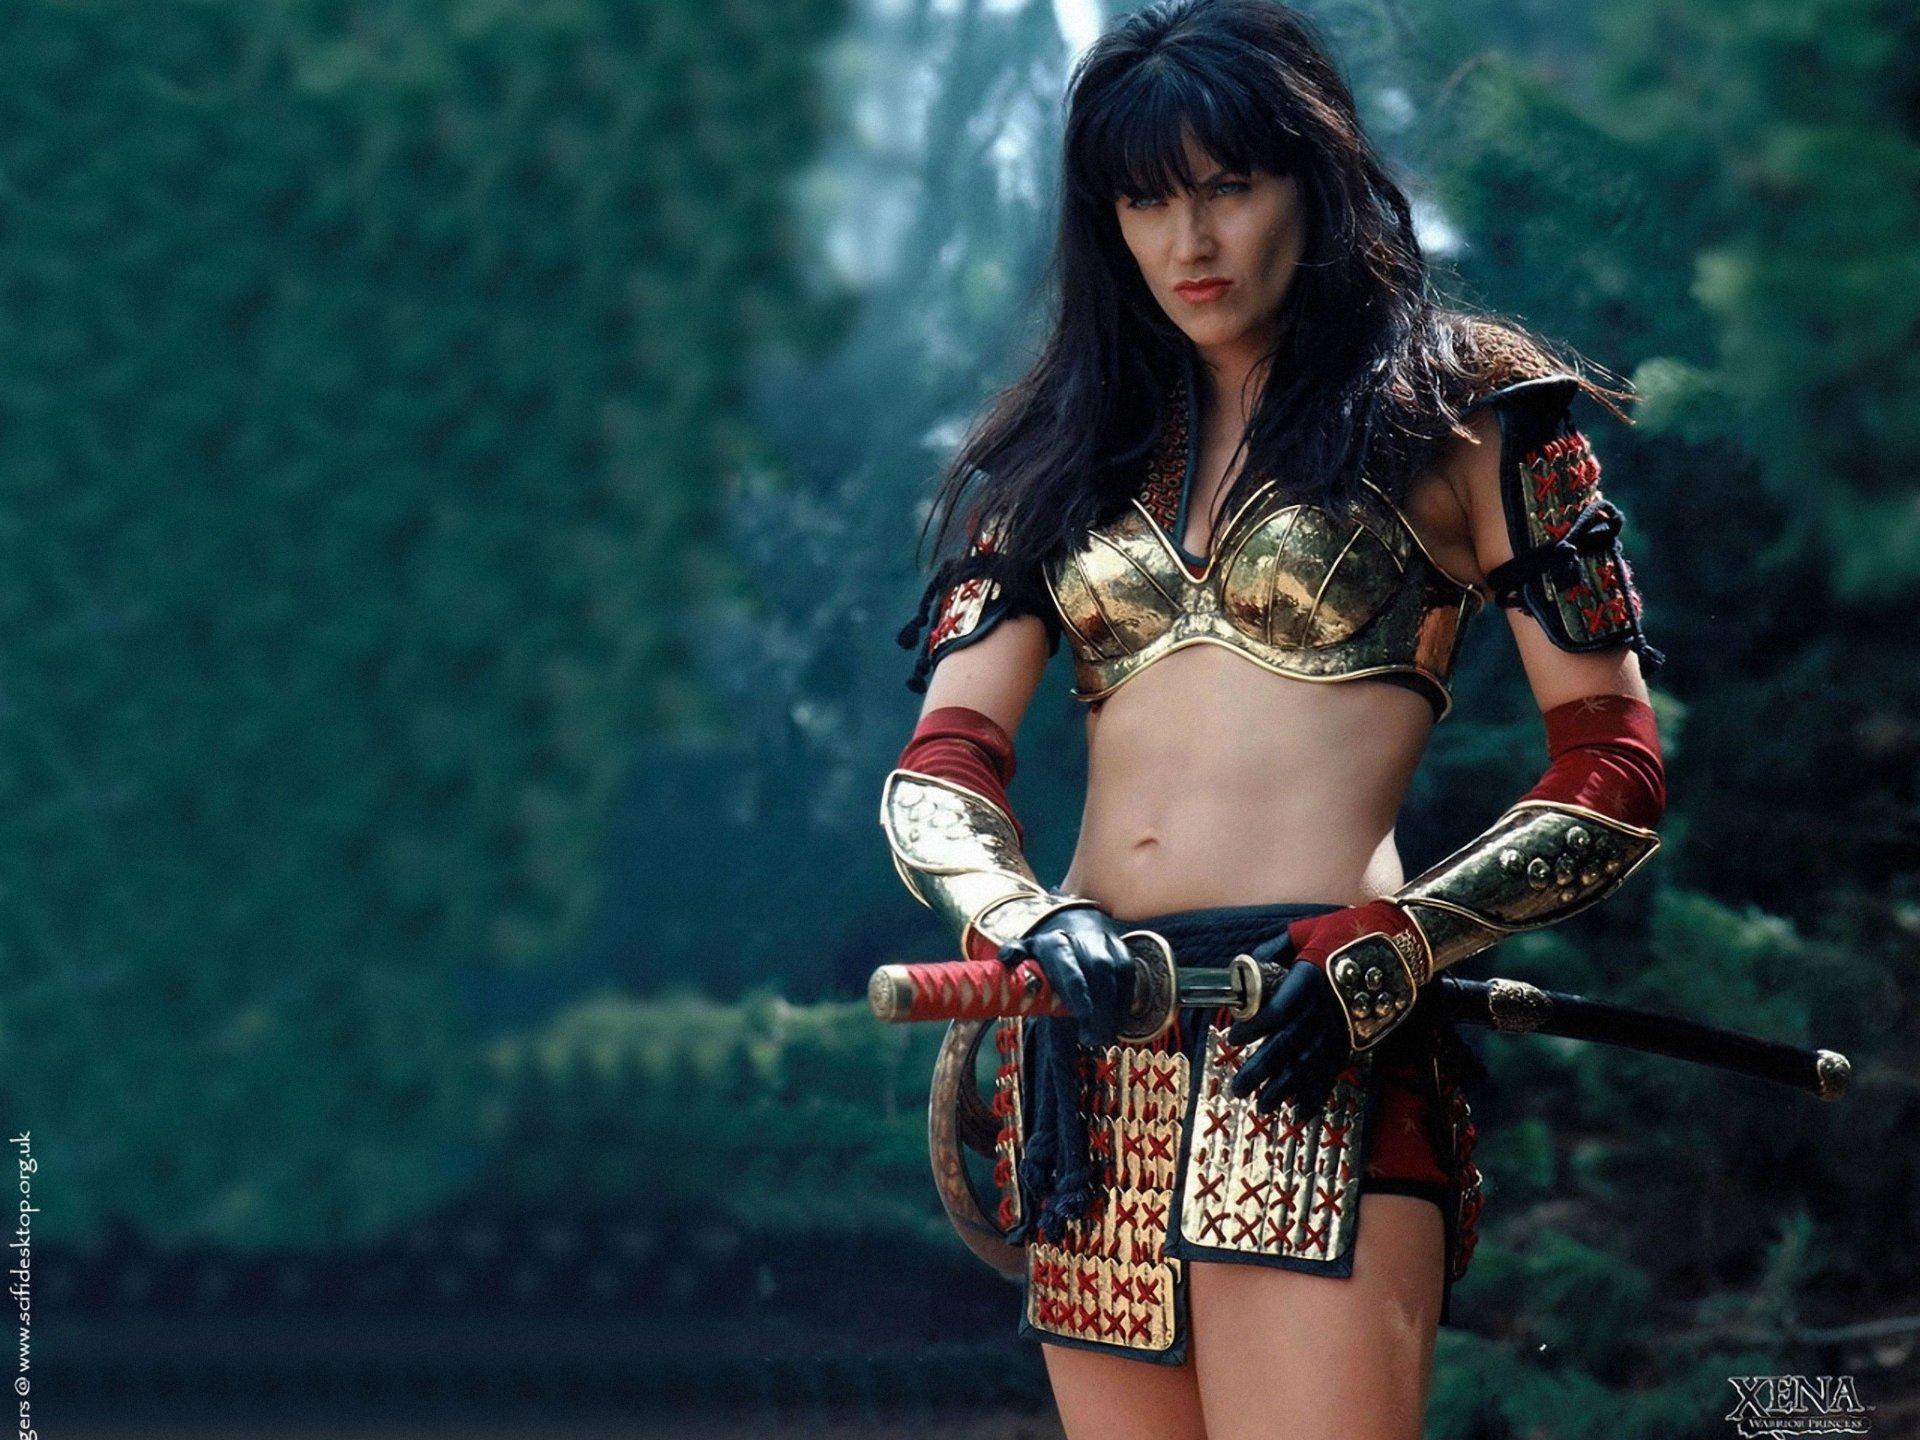 TV Show - Xena: Warrior Princess  Wallpaper